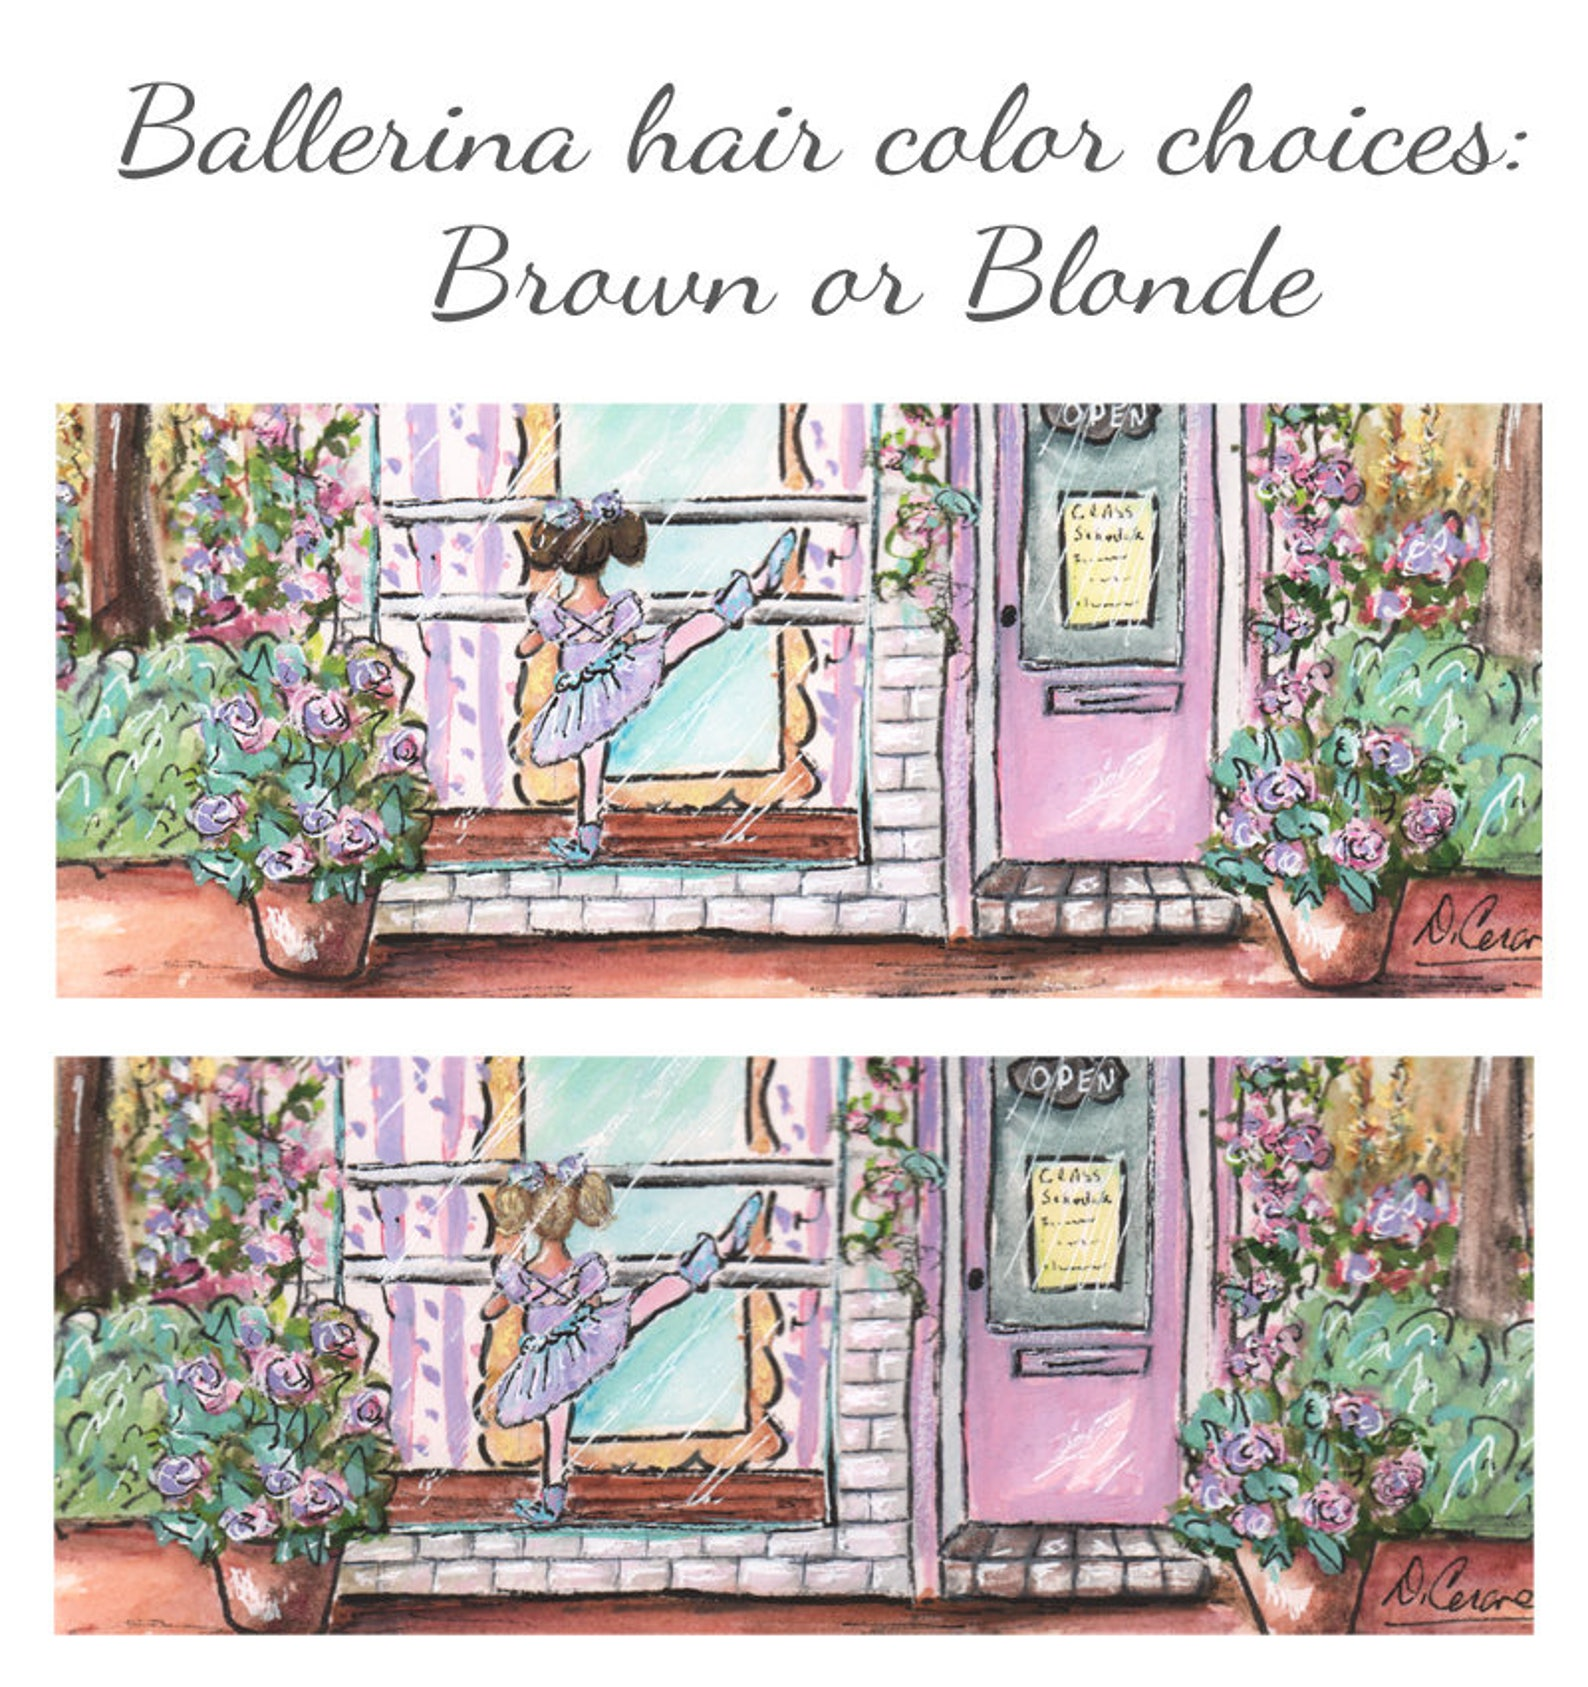 set of 3 ballet prints for girl ballerina gift personalized shabby chic vintage purple soft blush lavender, choose hair color, t